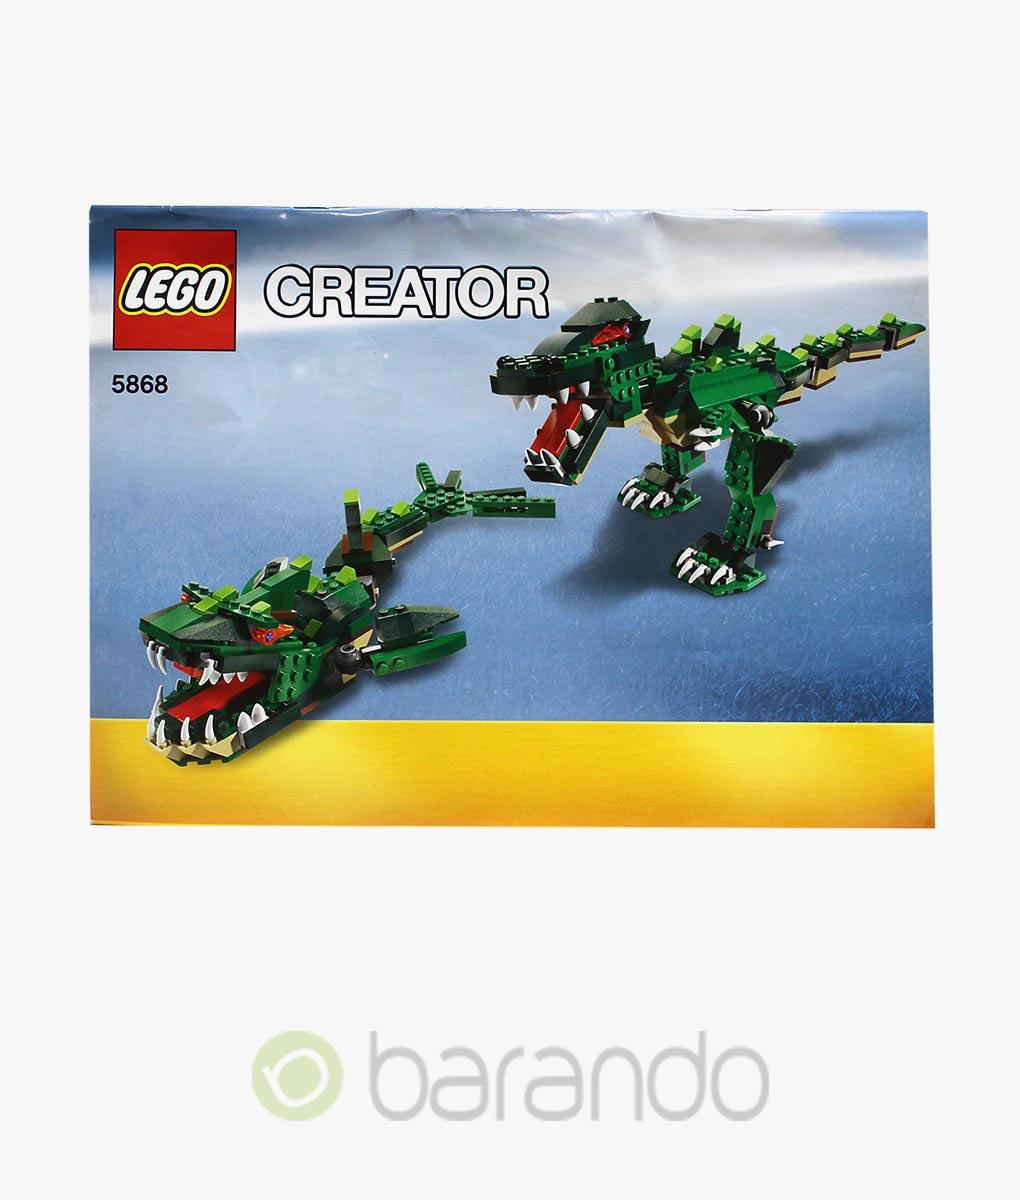 LEGO Creator 5868 Krokodil Set kaufen